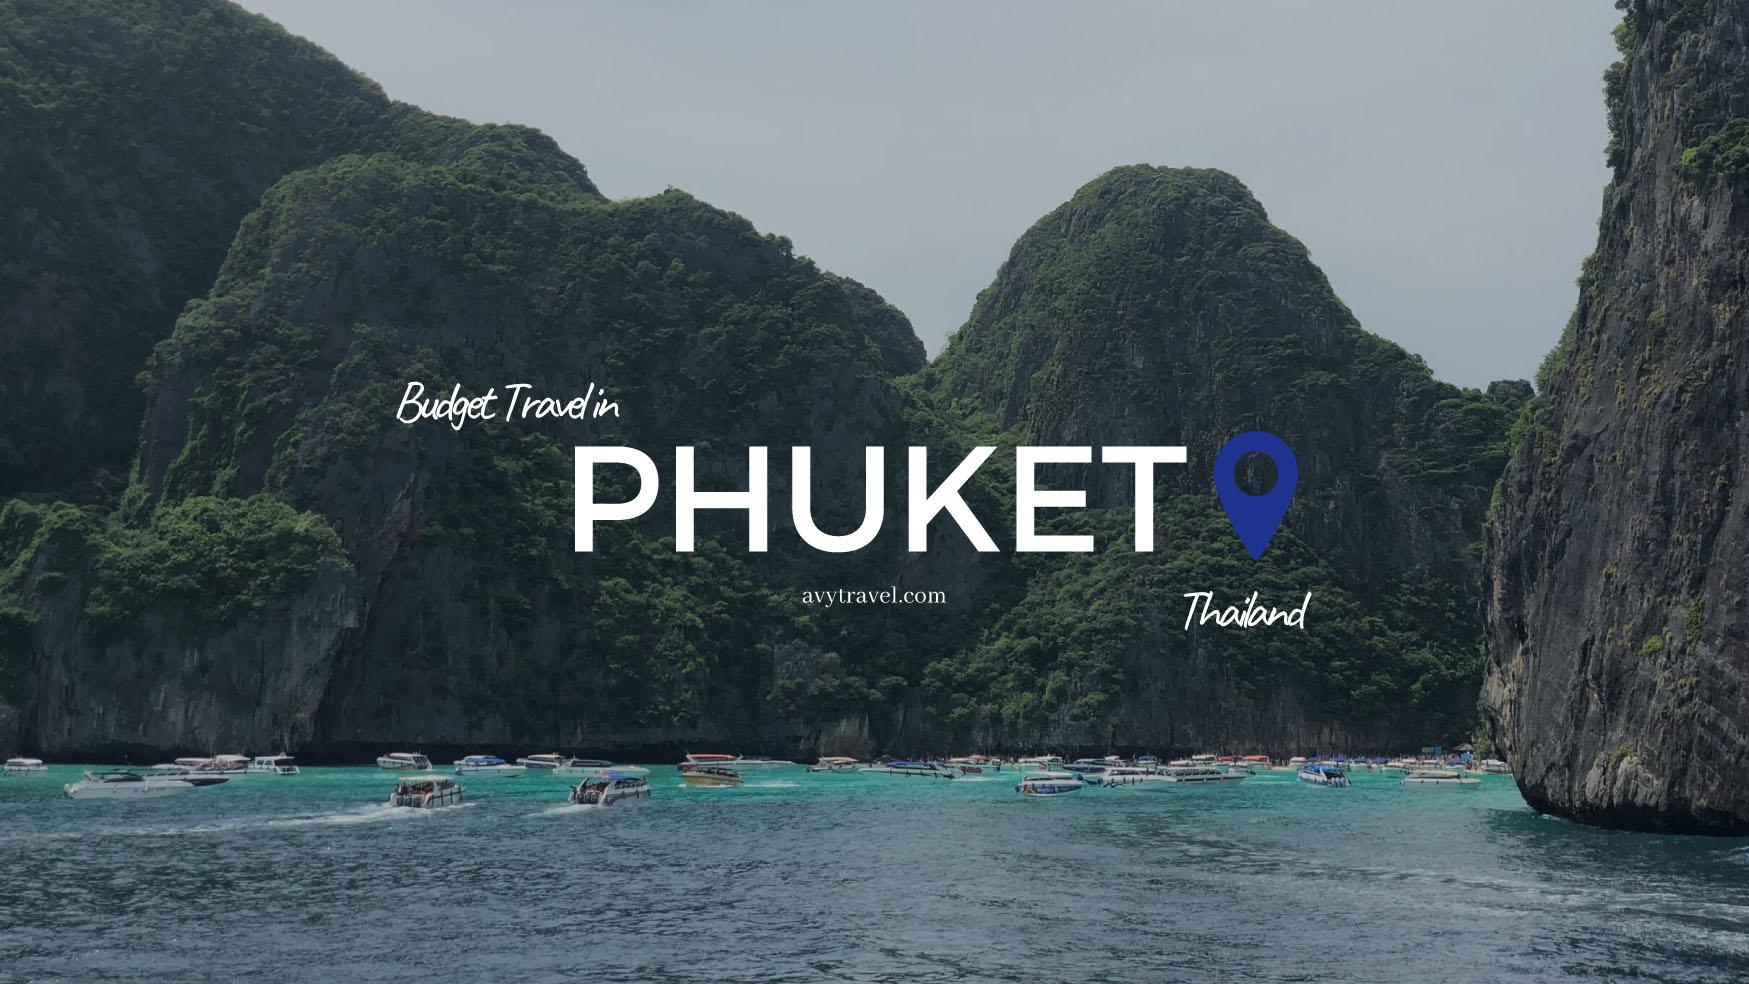 Budget Travel in Phuket